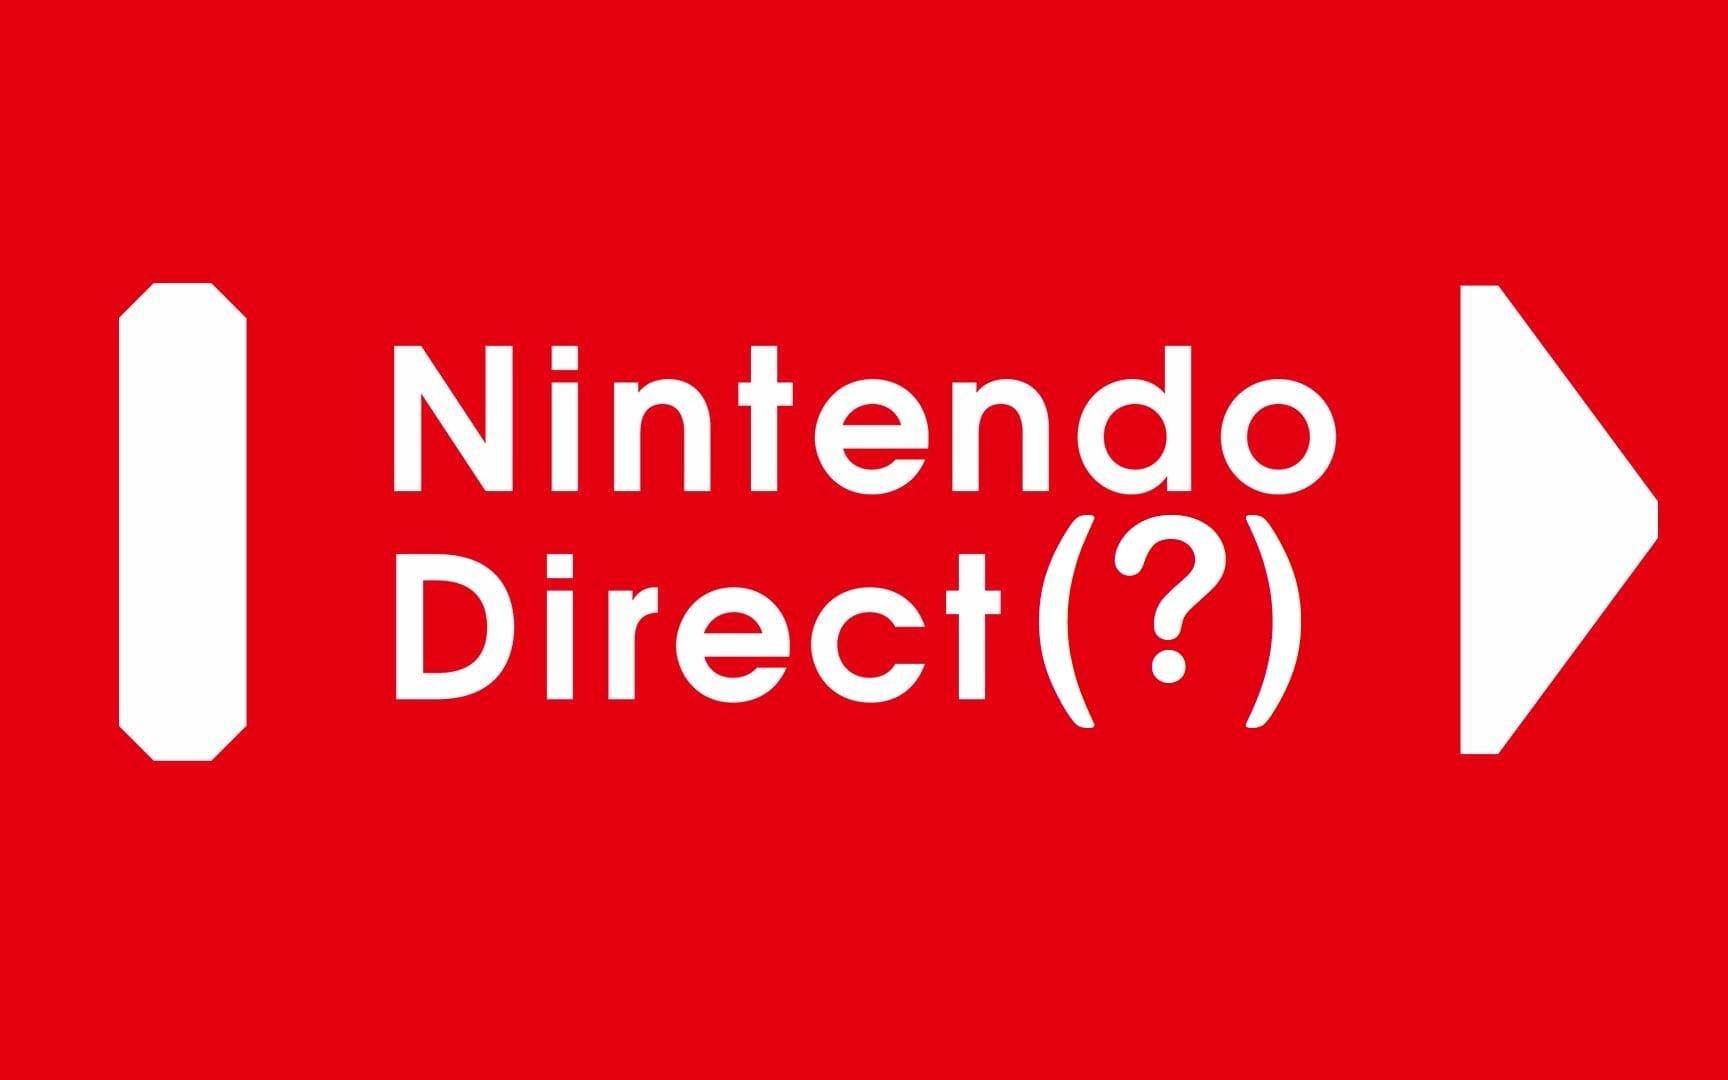 Direct Rumor